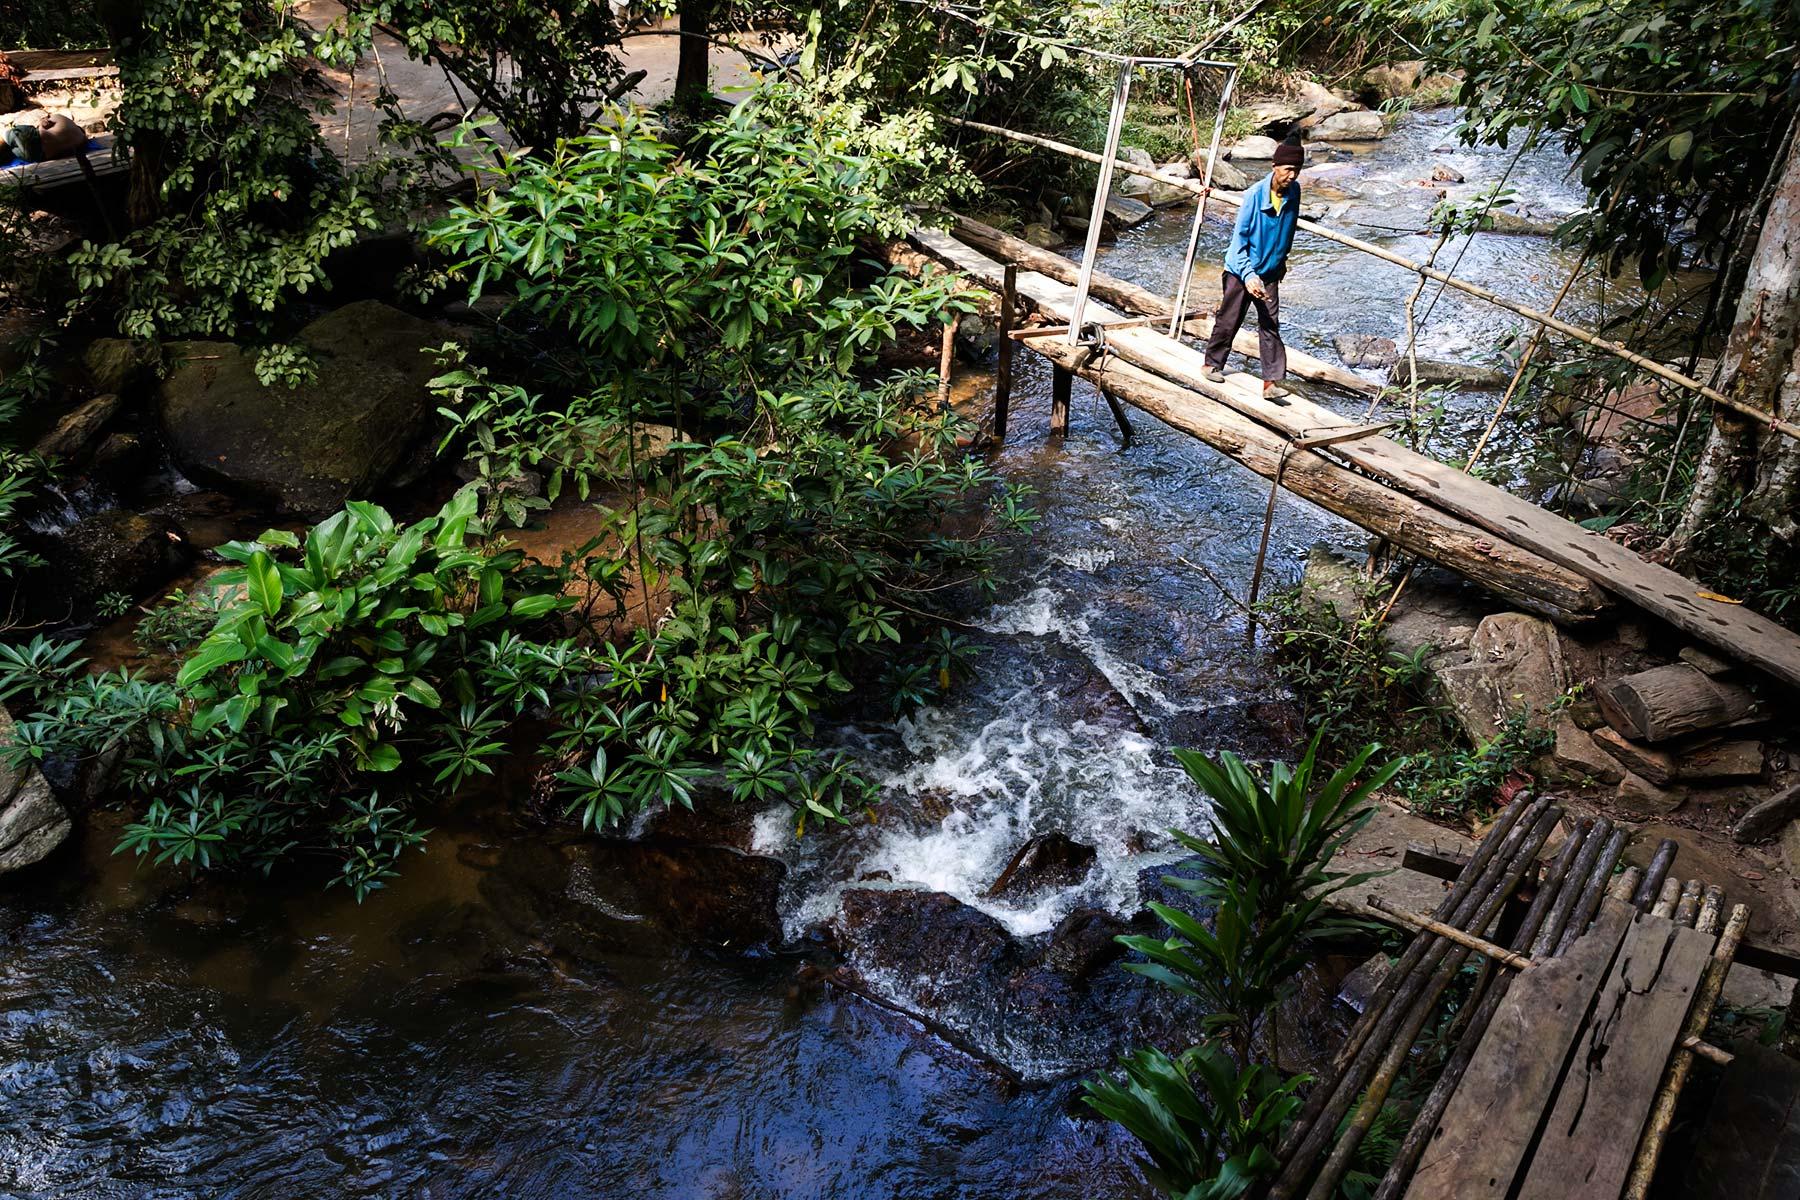 10-hiking-to-mae-wang-waterfall.jpg